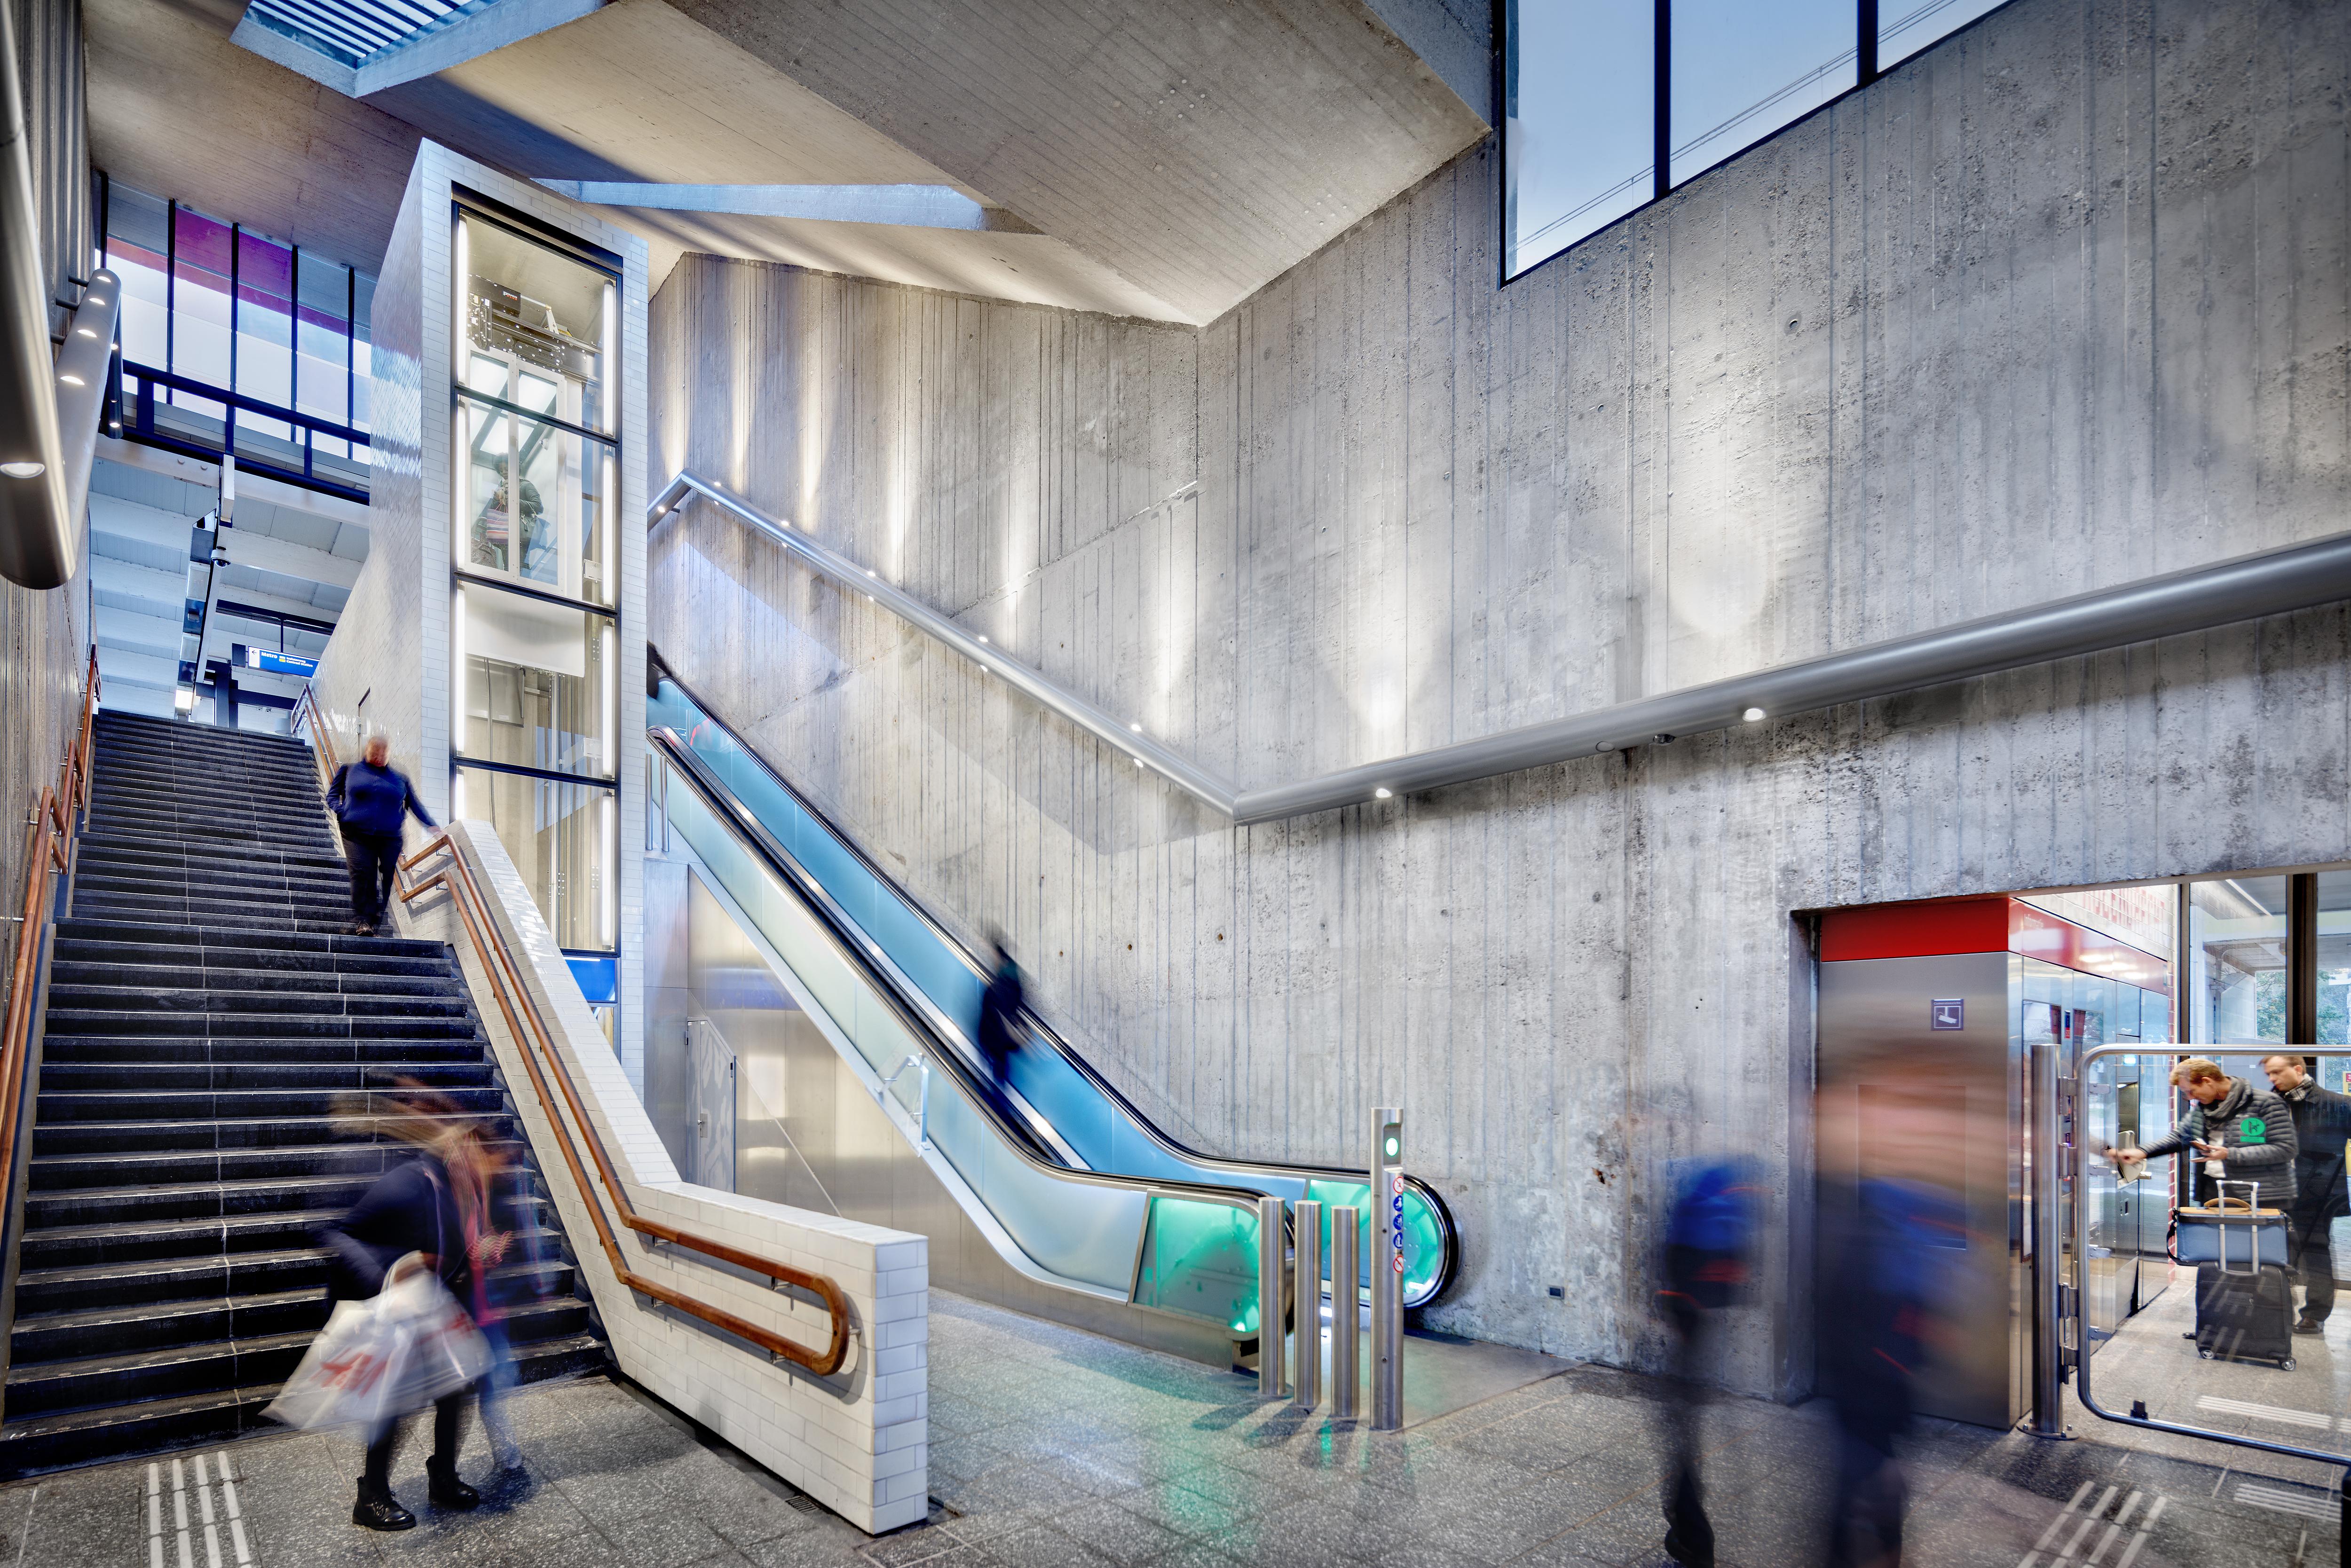 <p>Group A; Station Holendrecht, Amsterdam</p>